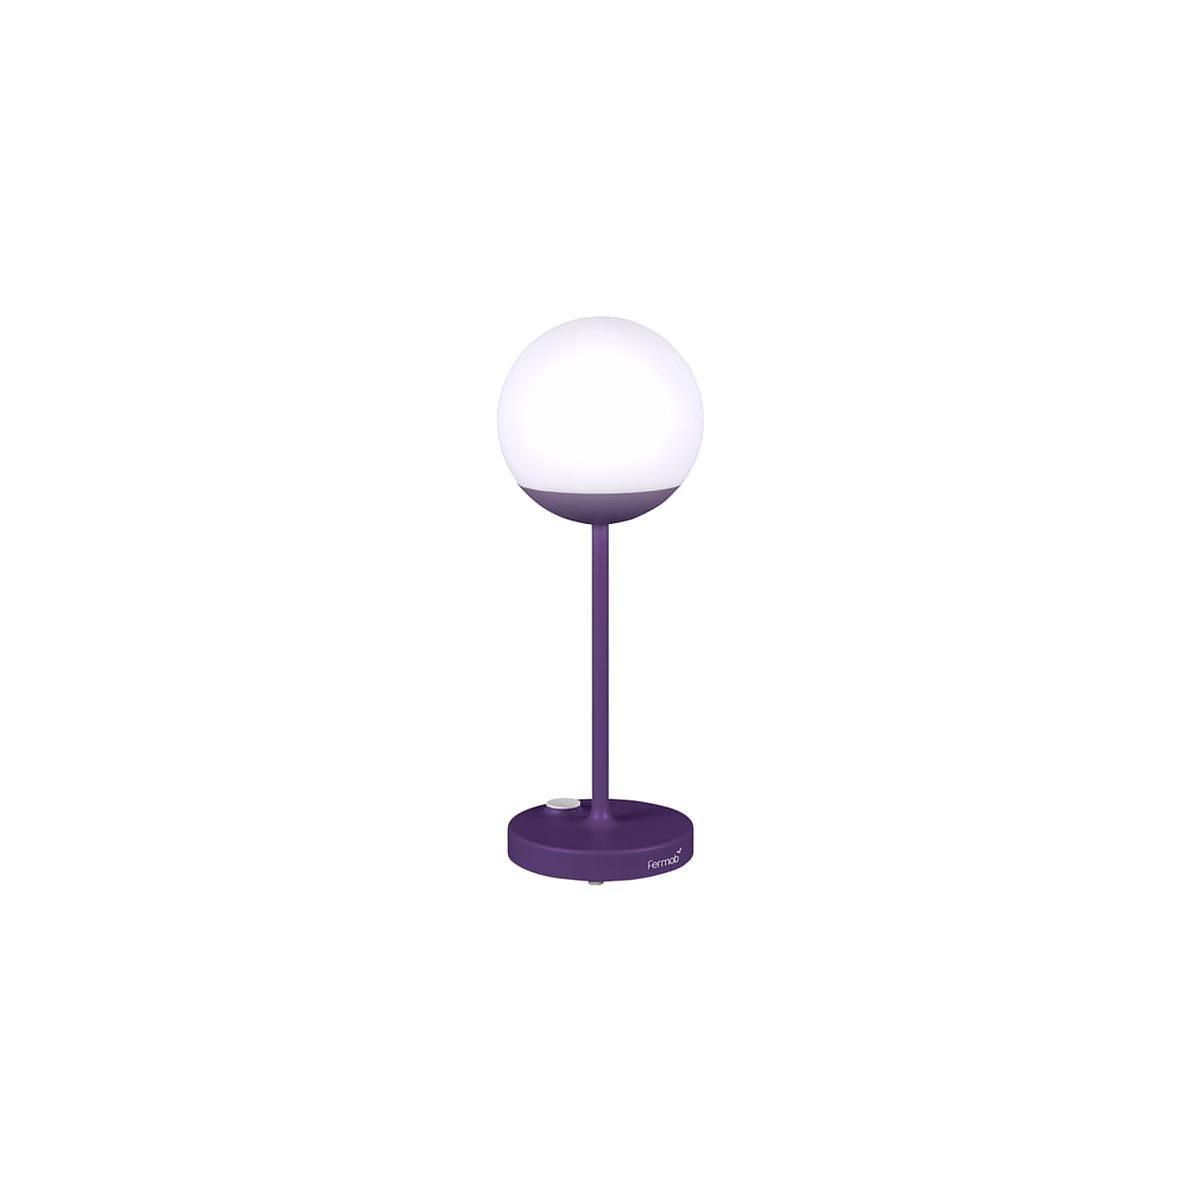 Lampe à poser MOON Fermob violet aubergine